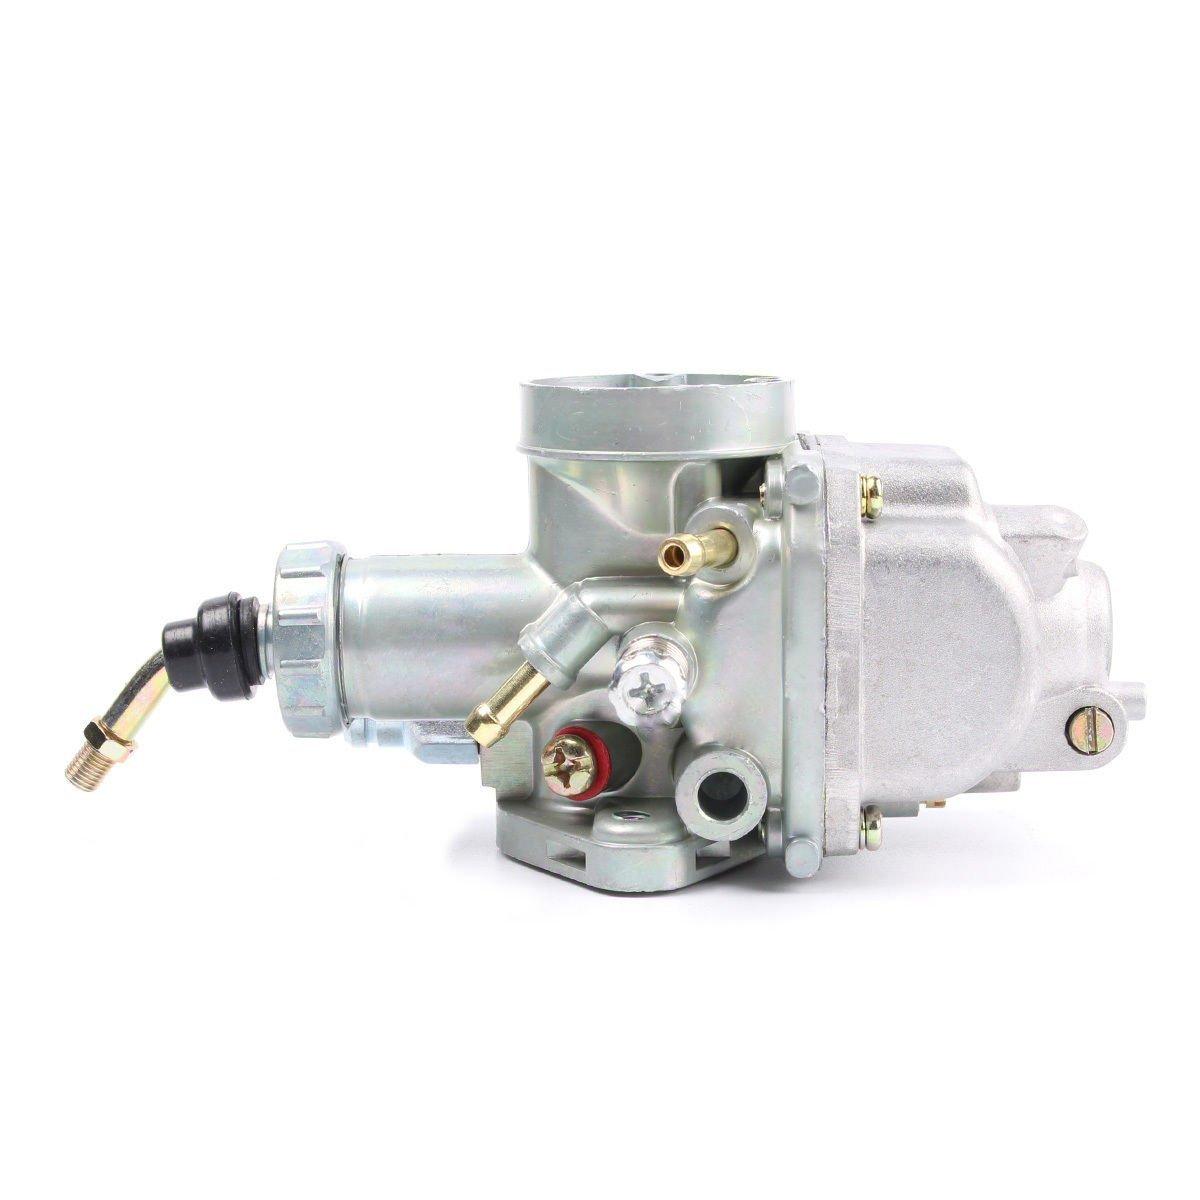 Auto-Moto Carburetor For Yamaha Breeze Grizzly 125 Timberwolf 250 YFM225